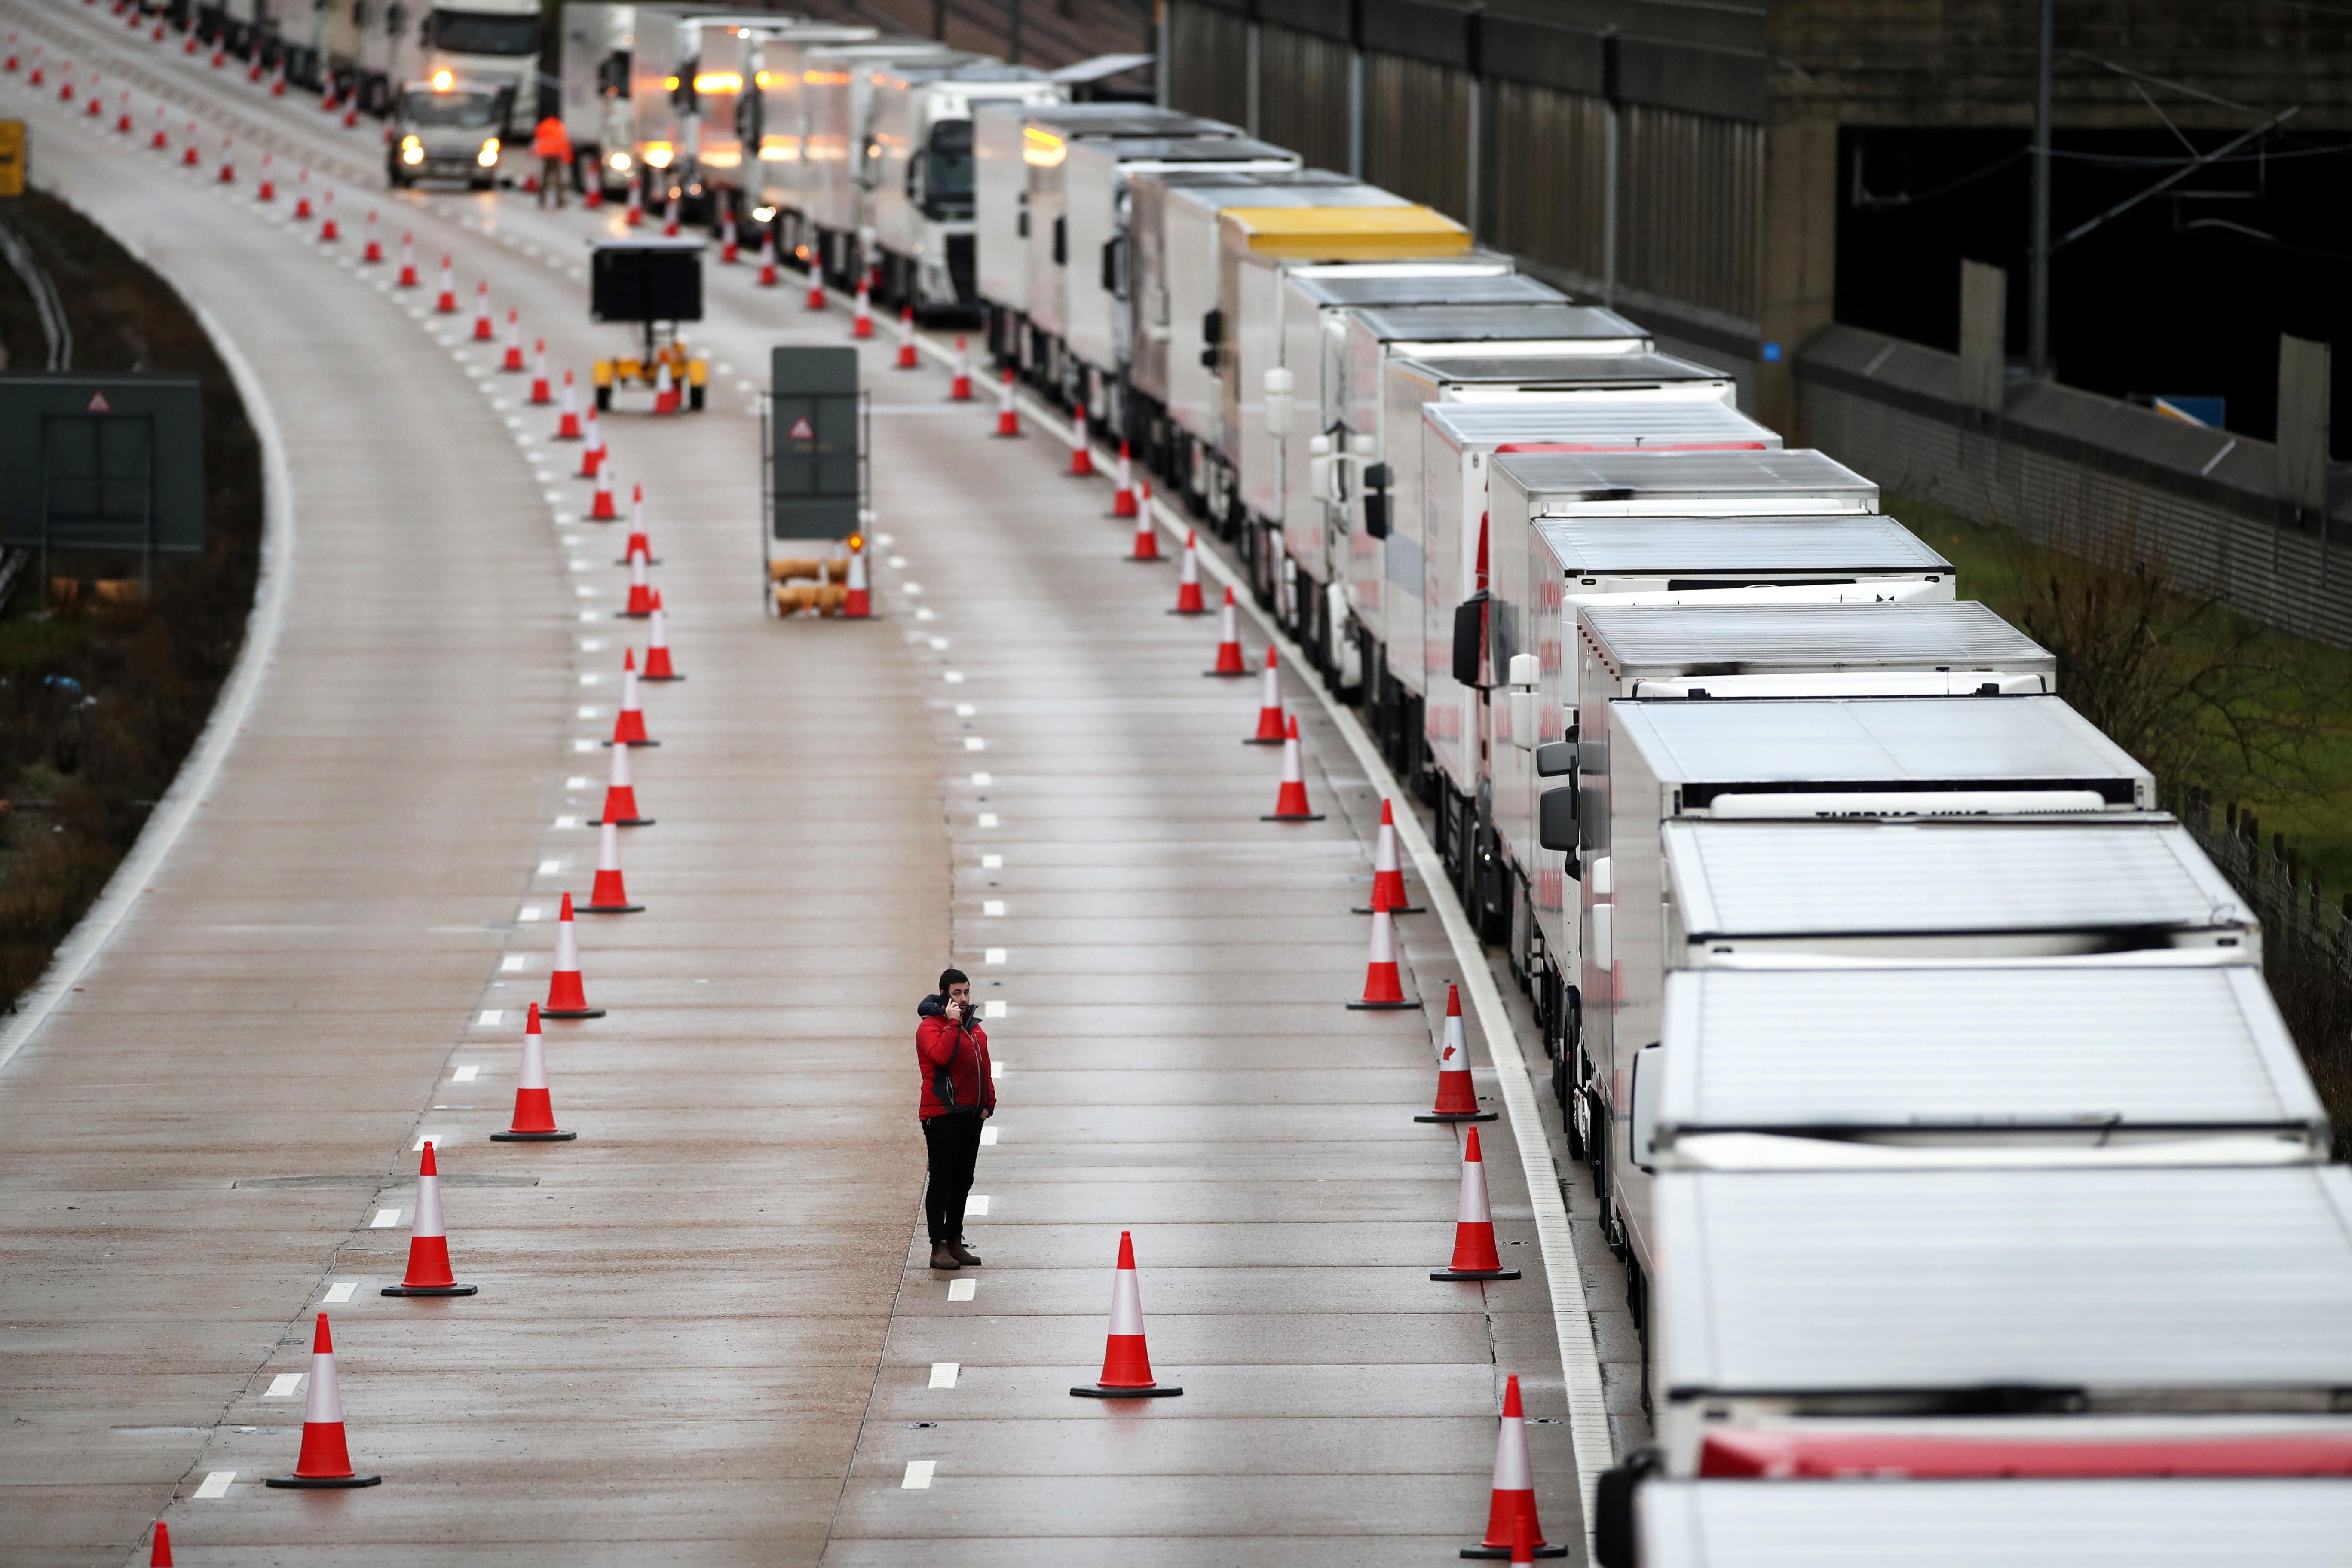 Lorries queue on the M20 motorway as part of Operation Stack following the coronavirus disease